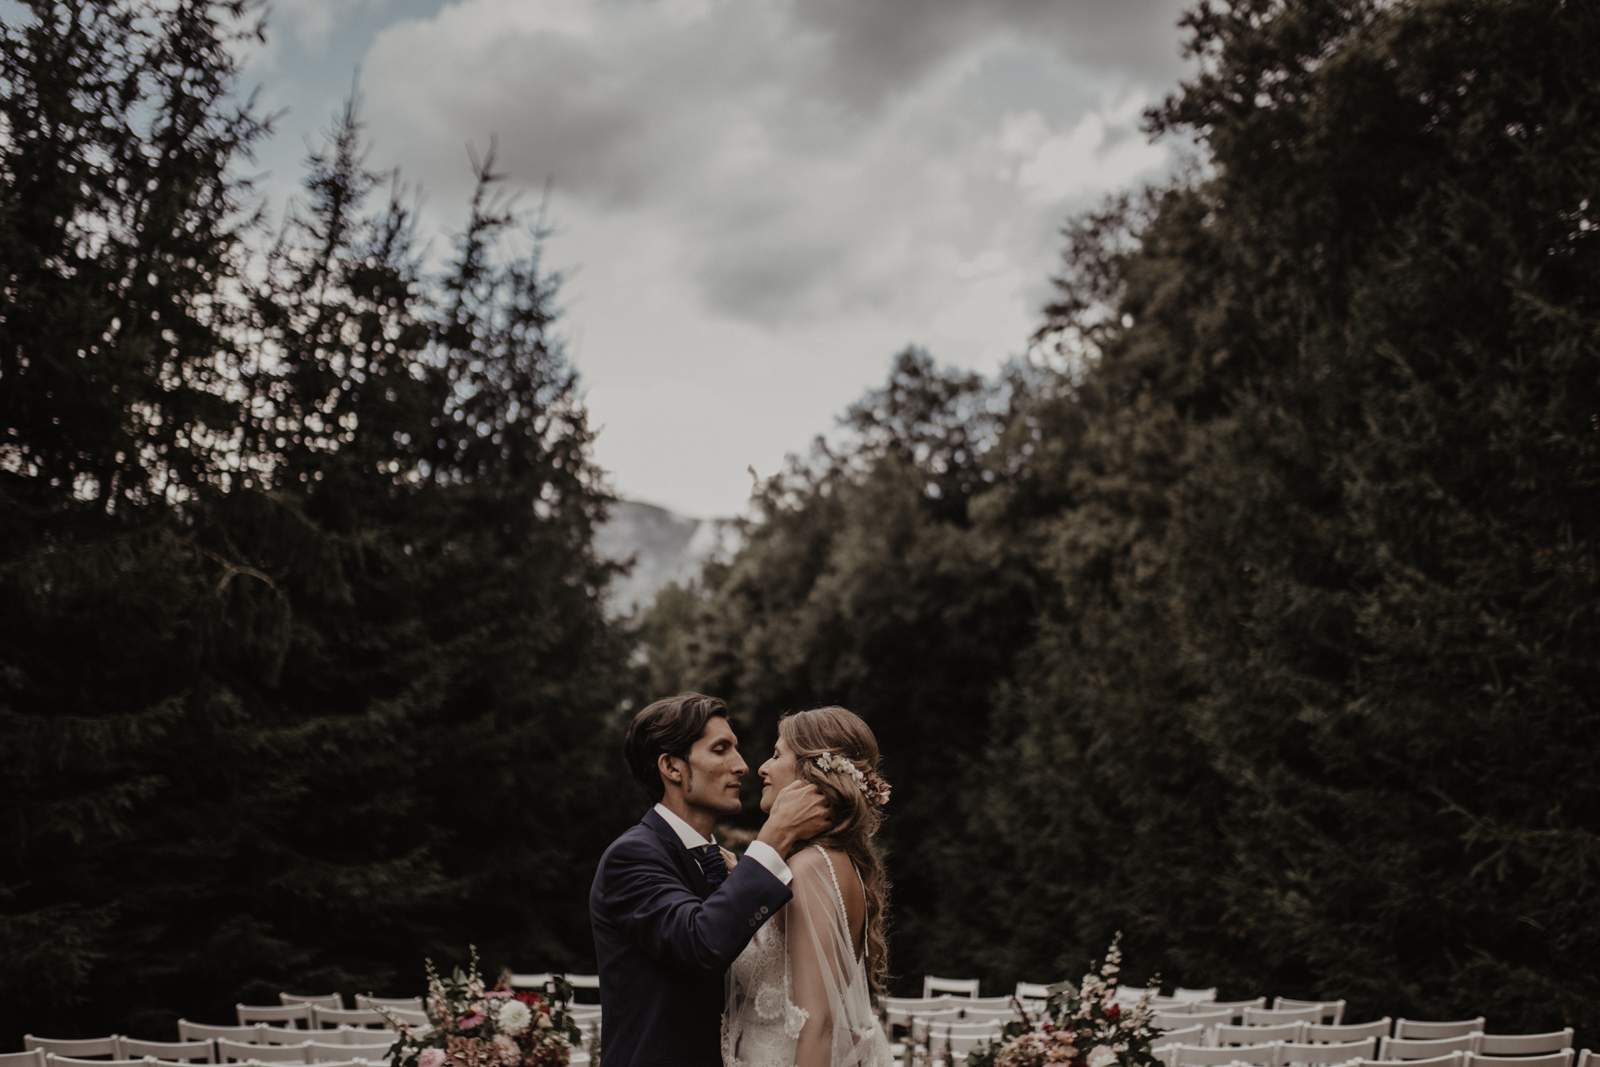 thenortherngirlphotography_photography_thenortherngirl_rebeccascabros_wedding_weddingphotography_weddingphotographer_barcelona_bodaenbarcelona_bodaenmaselmarti_bodarogeryvane-523.jpg